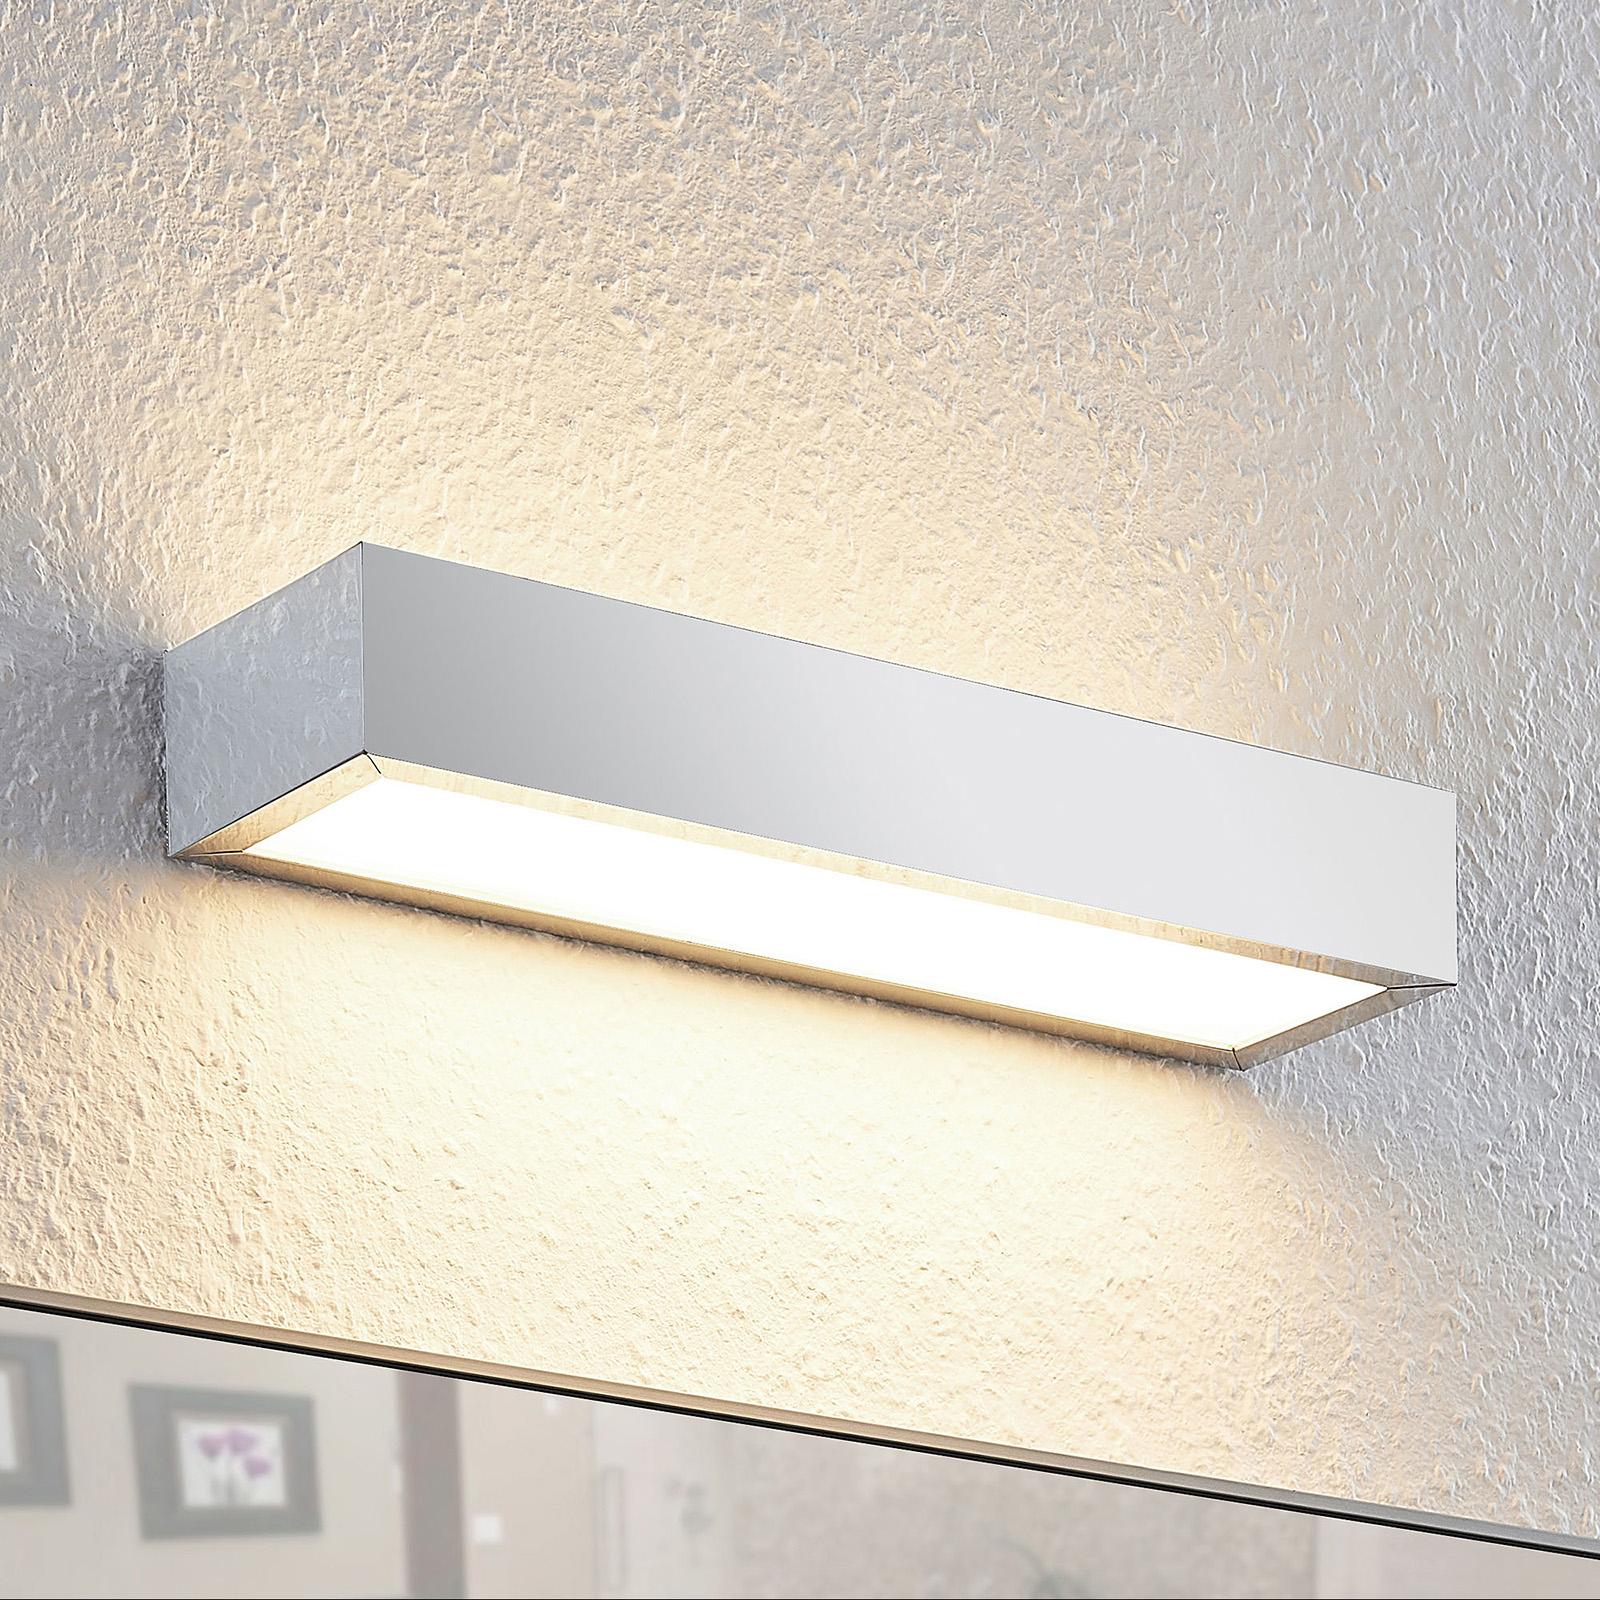 Lindby Layan applique LED per il bagno cromo 30 cm